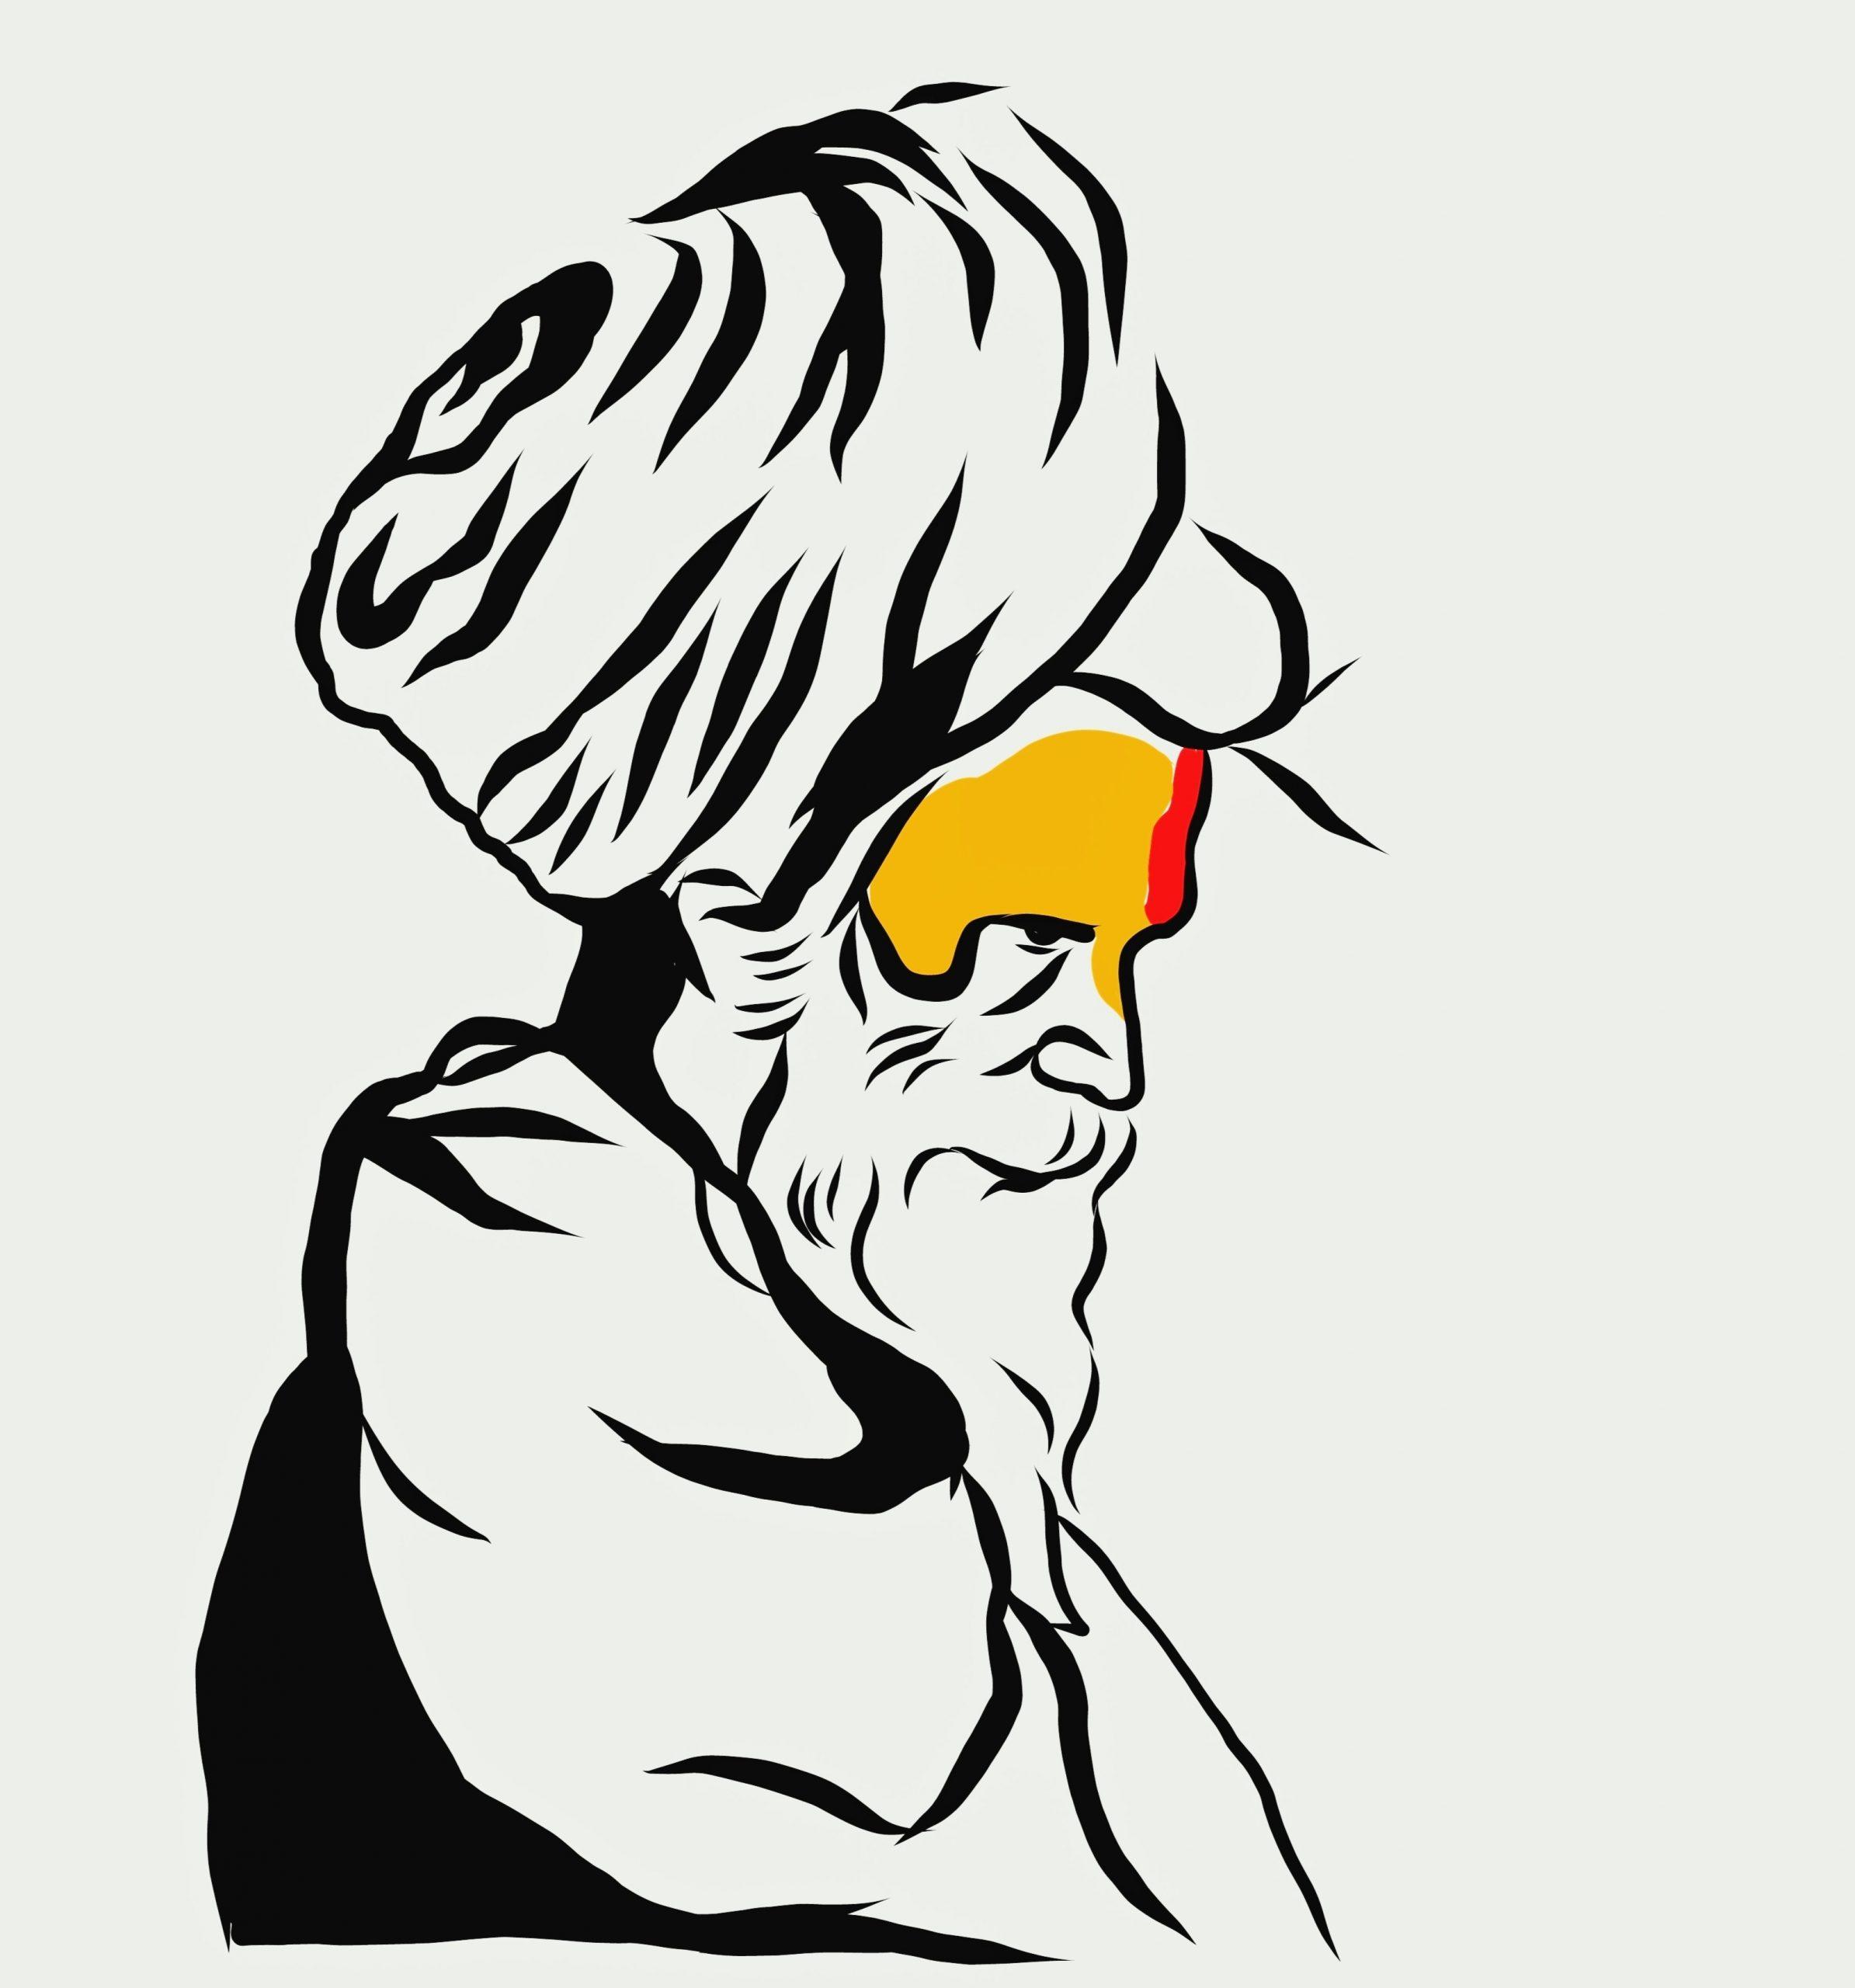 Portrait illustration of an Indian monk